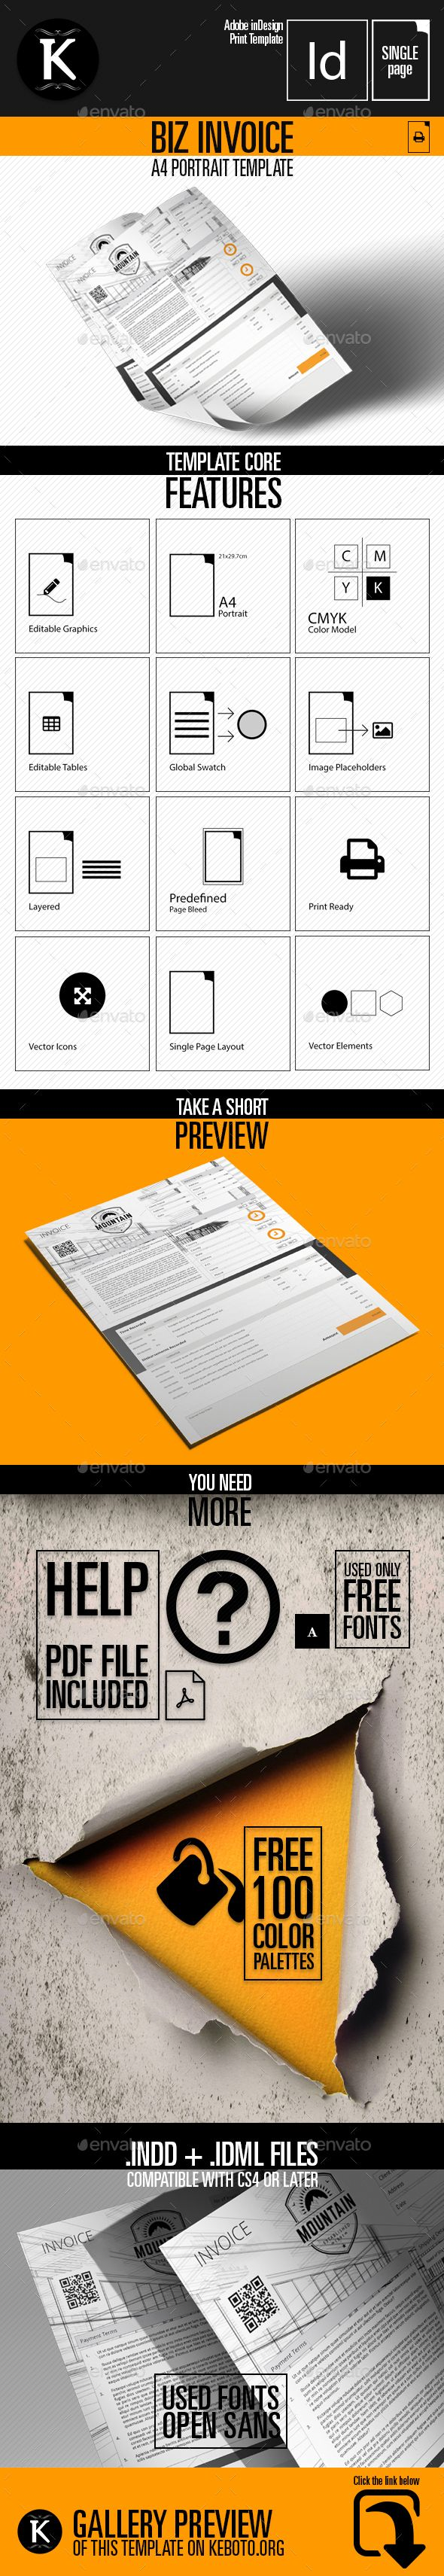 Mejores 1287 imágenes de Graphic Design en Pinterest | Adobe ...